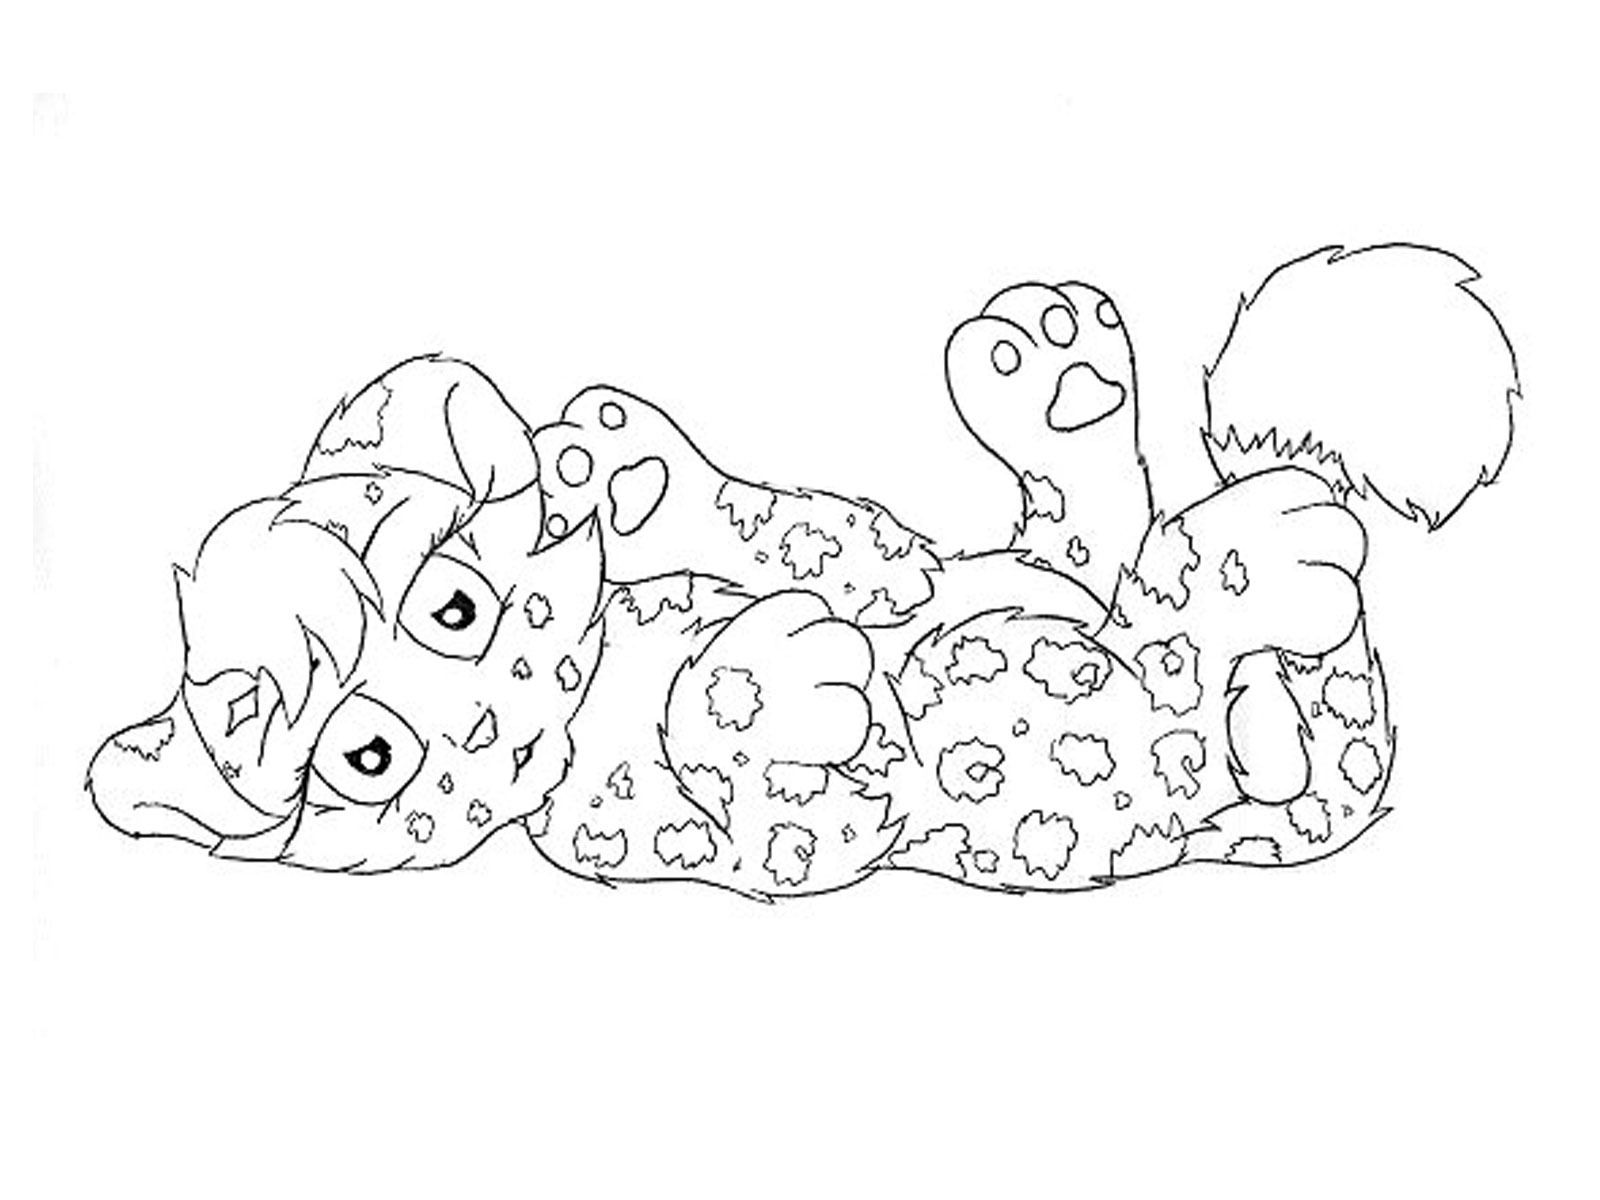 baby jaguar coloring pages | Baby milestones | Pinterest